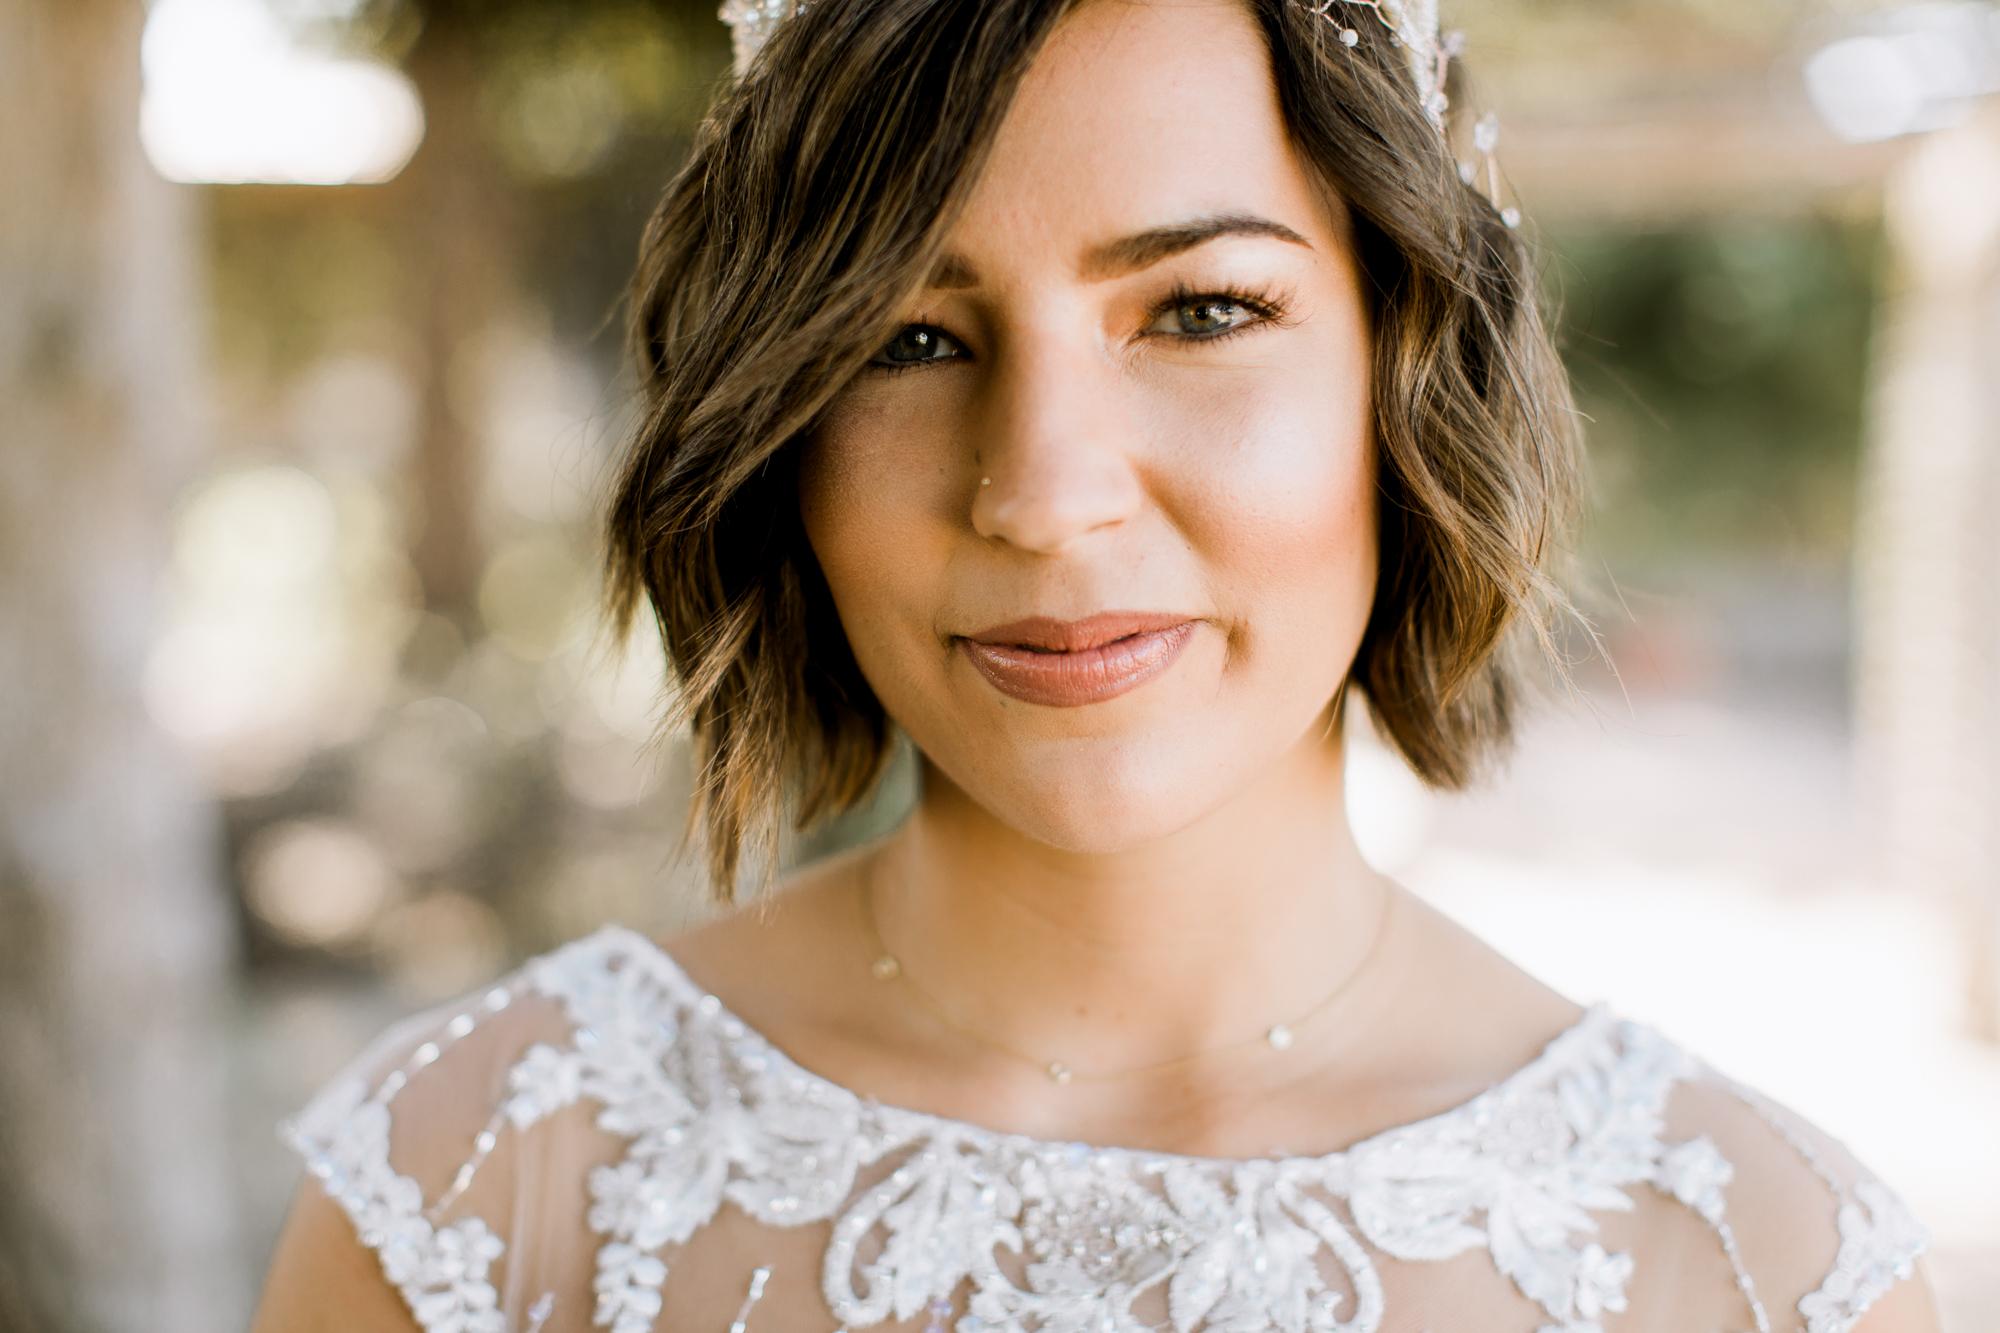 hipster bride // Fall Garden party wedding at Lady Bird Johnson Wildflower Center // austin, texas wedding photographer // www.abbihearne.com